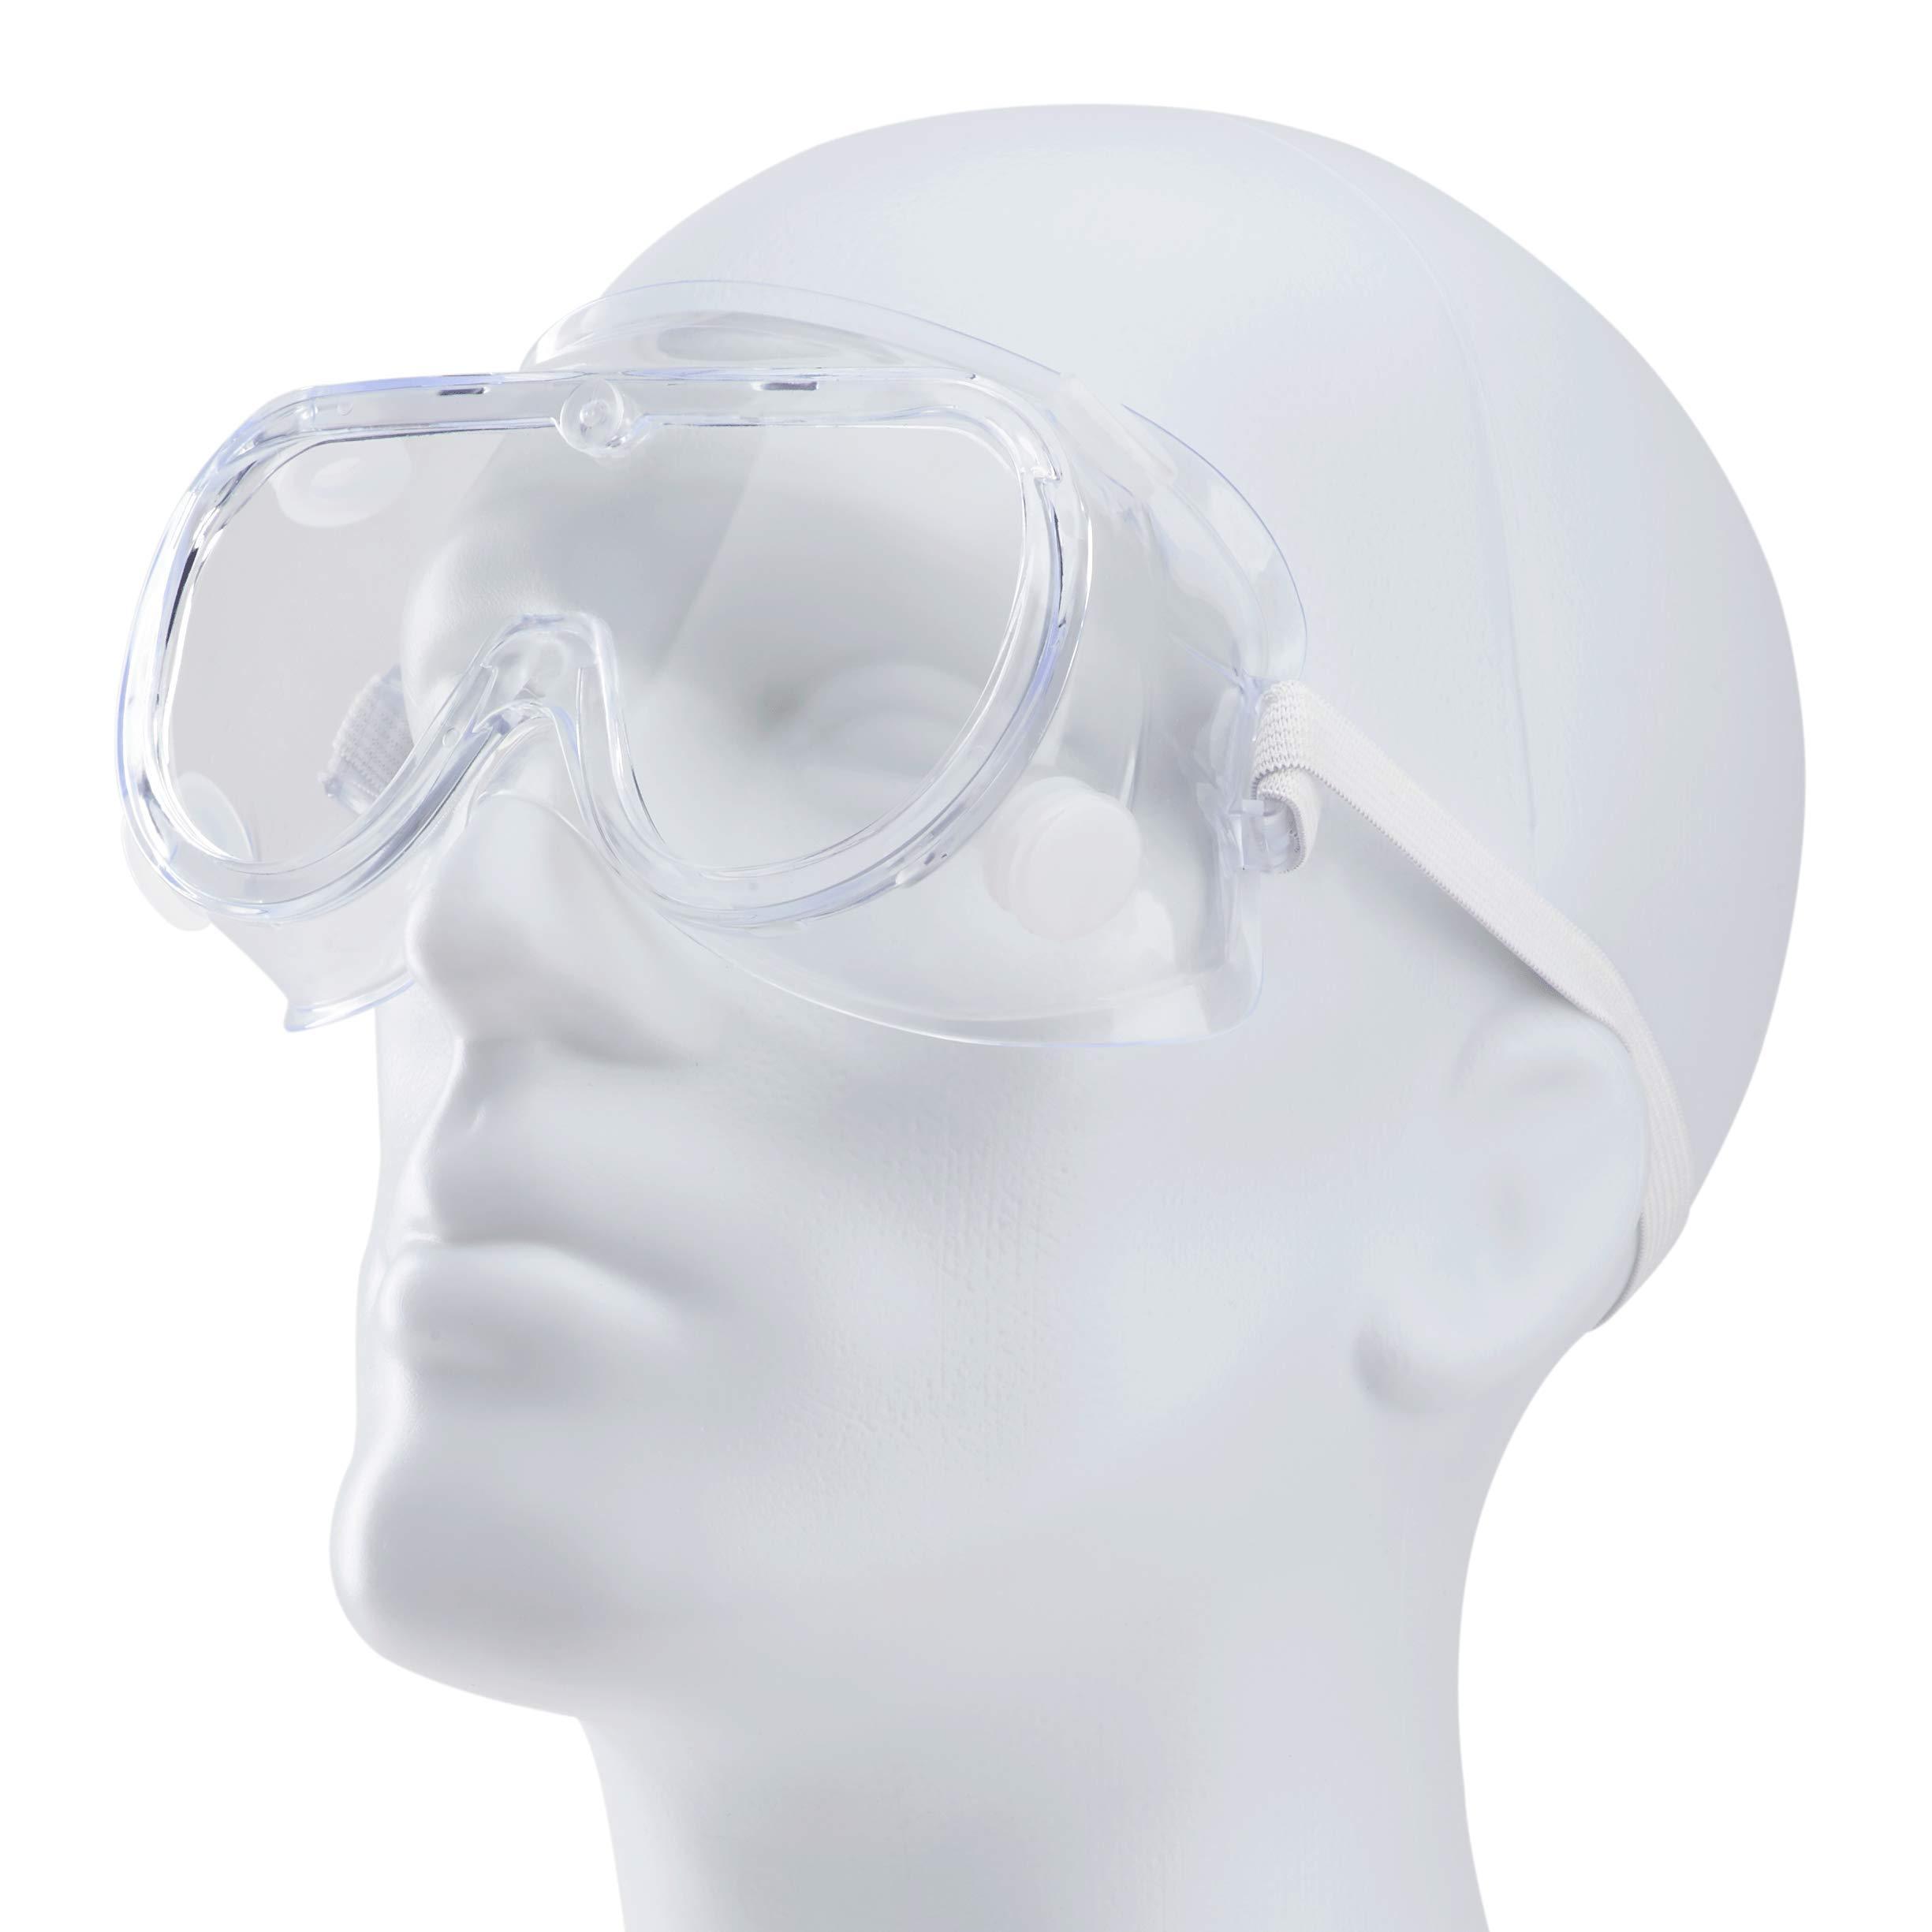 Karat Anti-Fog Safety Goggles (Pack of 15)